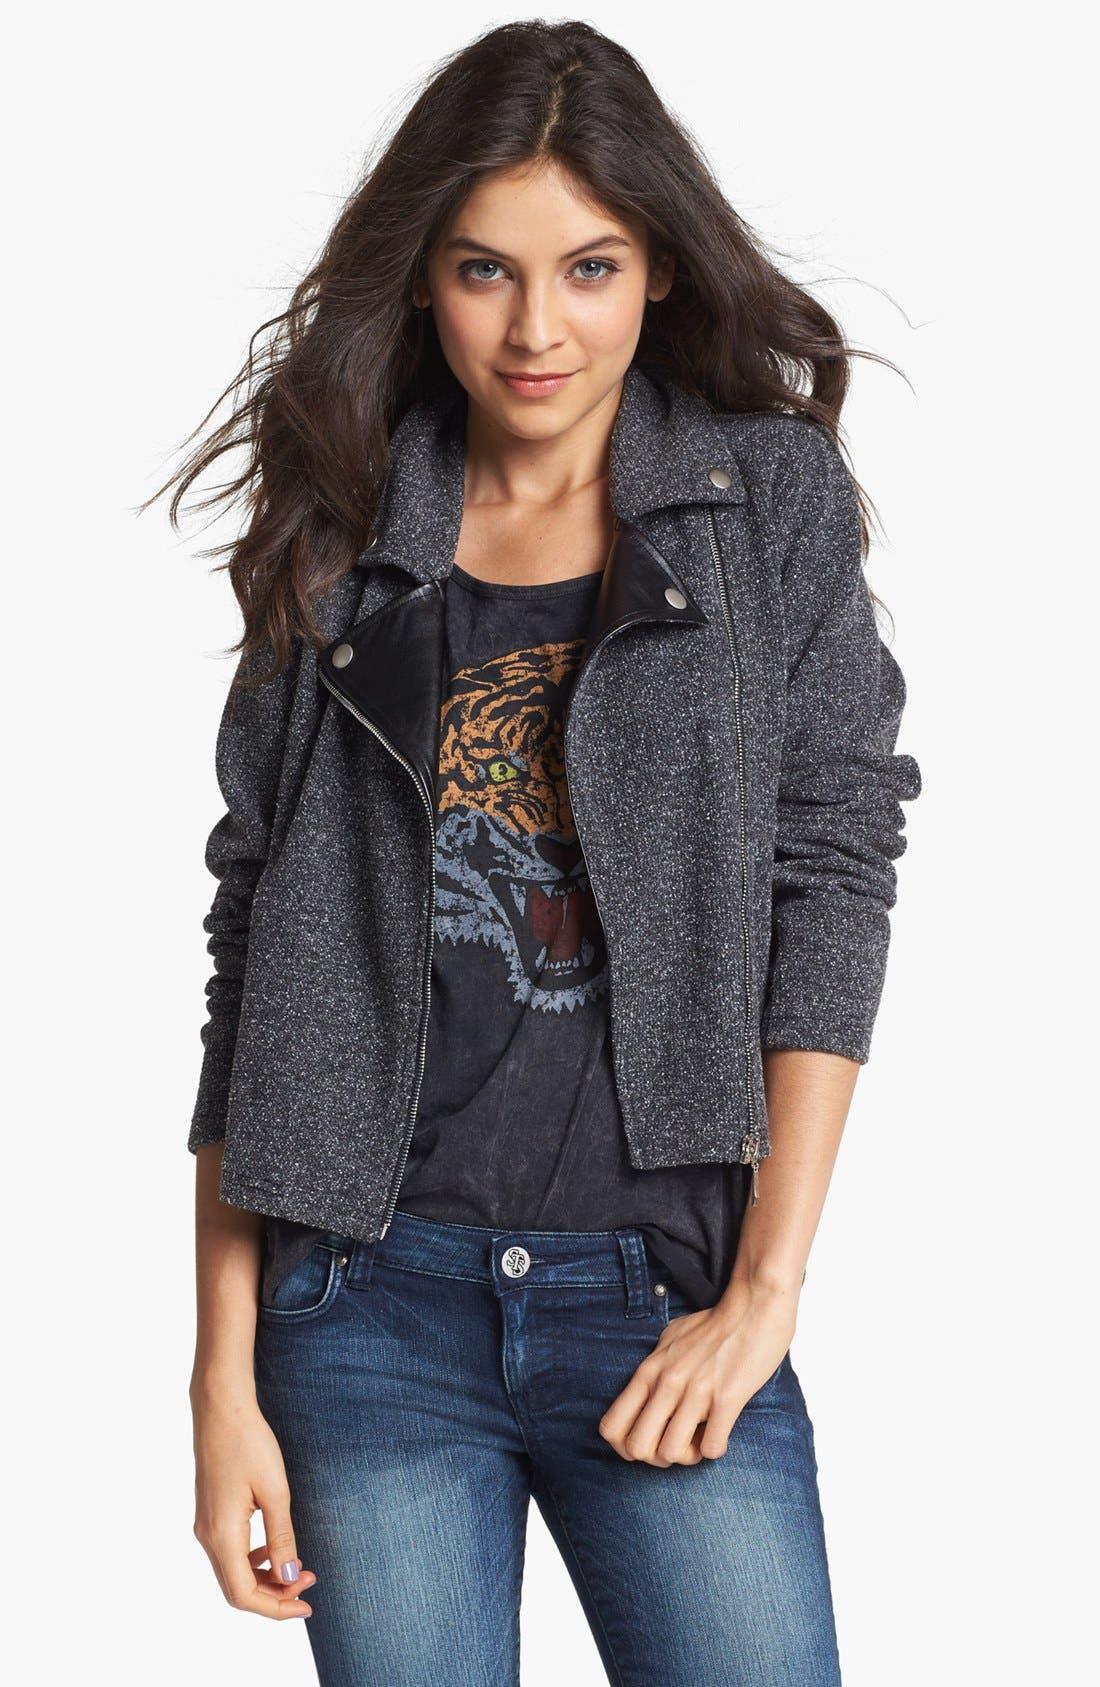 Alternate Image 1 Selected - Original Frenchi Faux Leather Lapel Tweed Moto Jacket (Juniors)